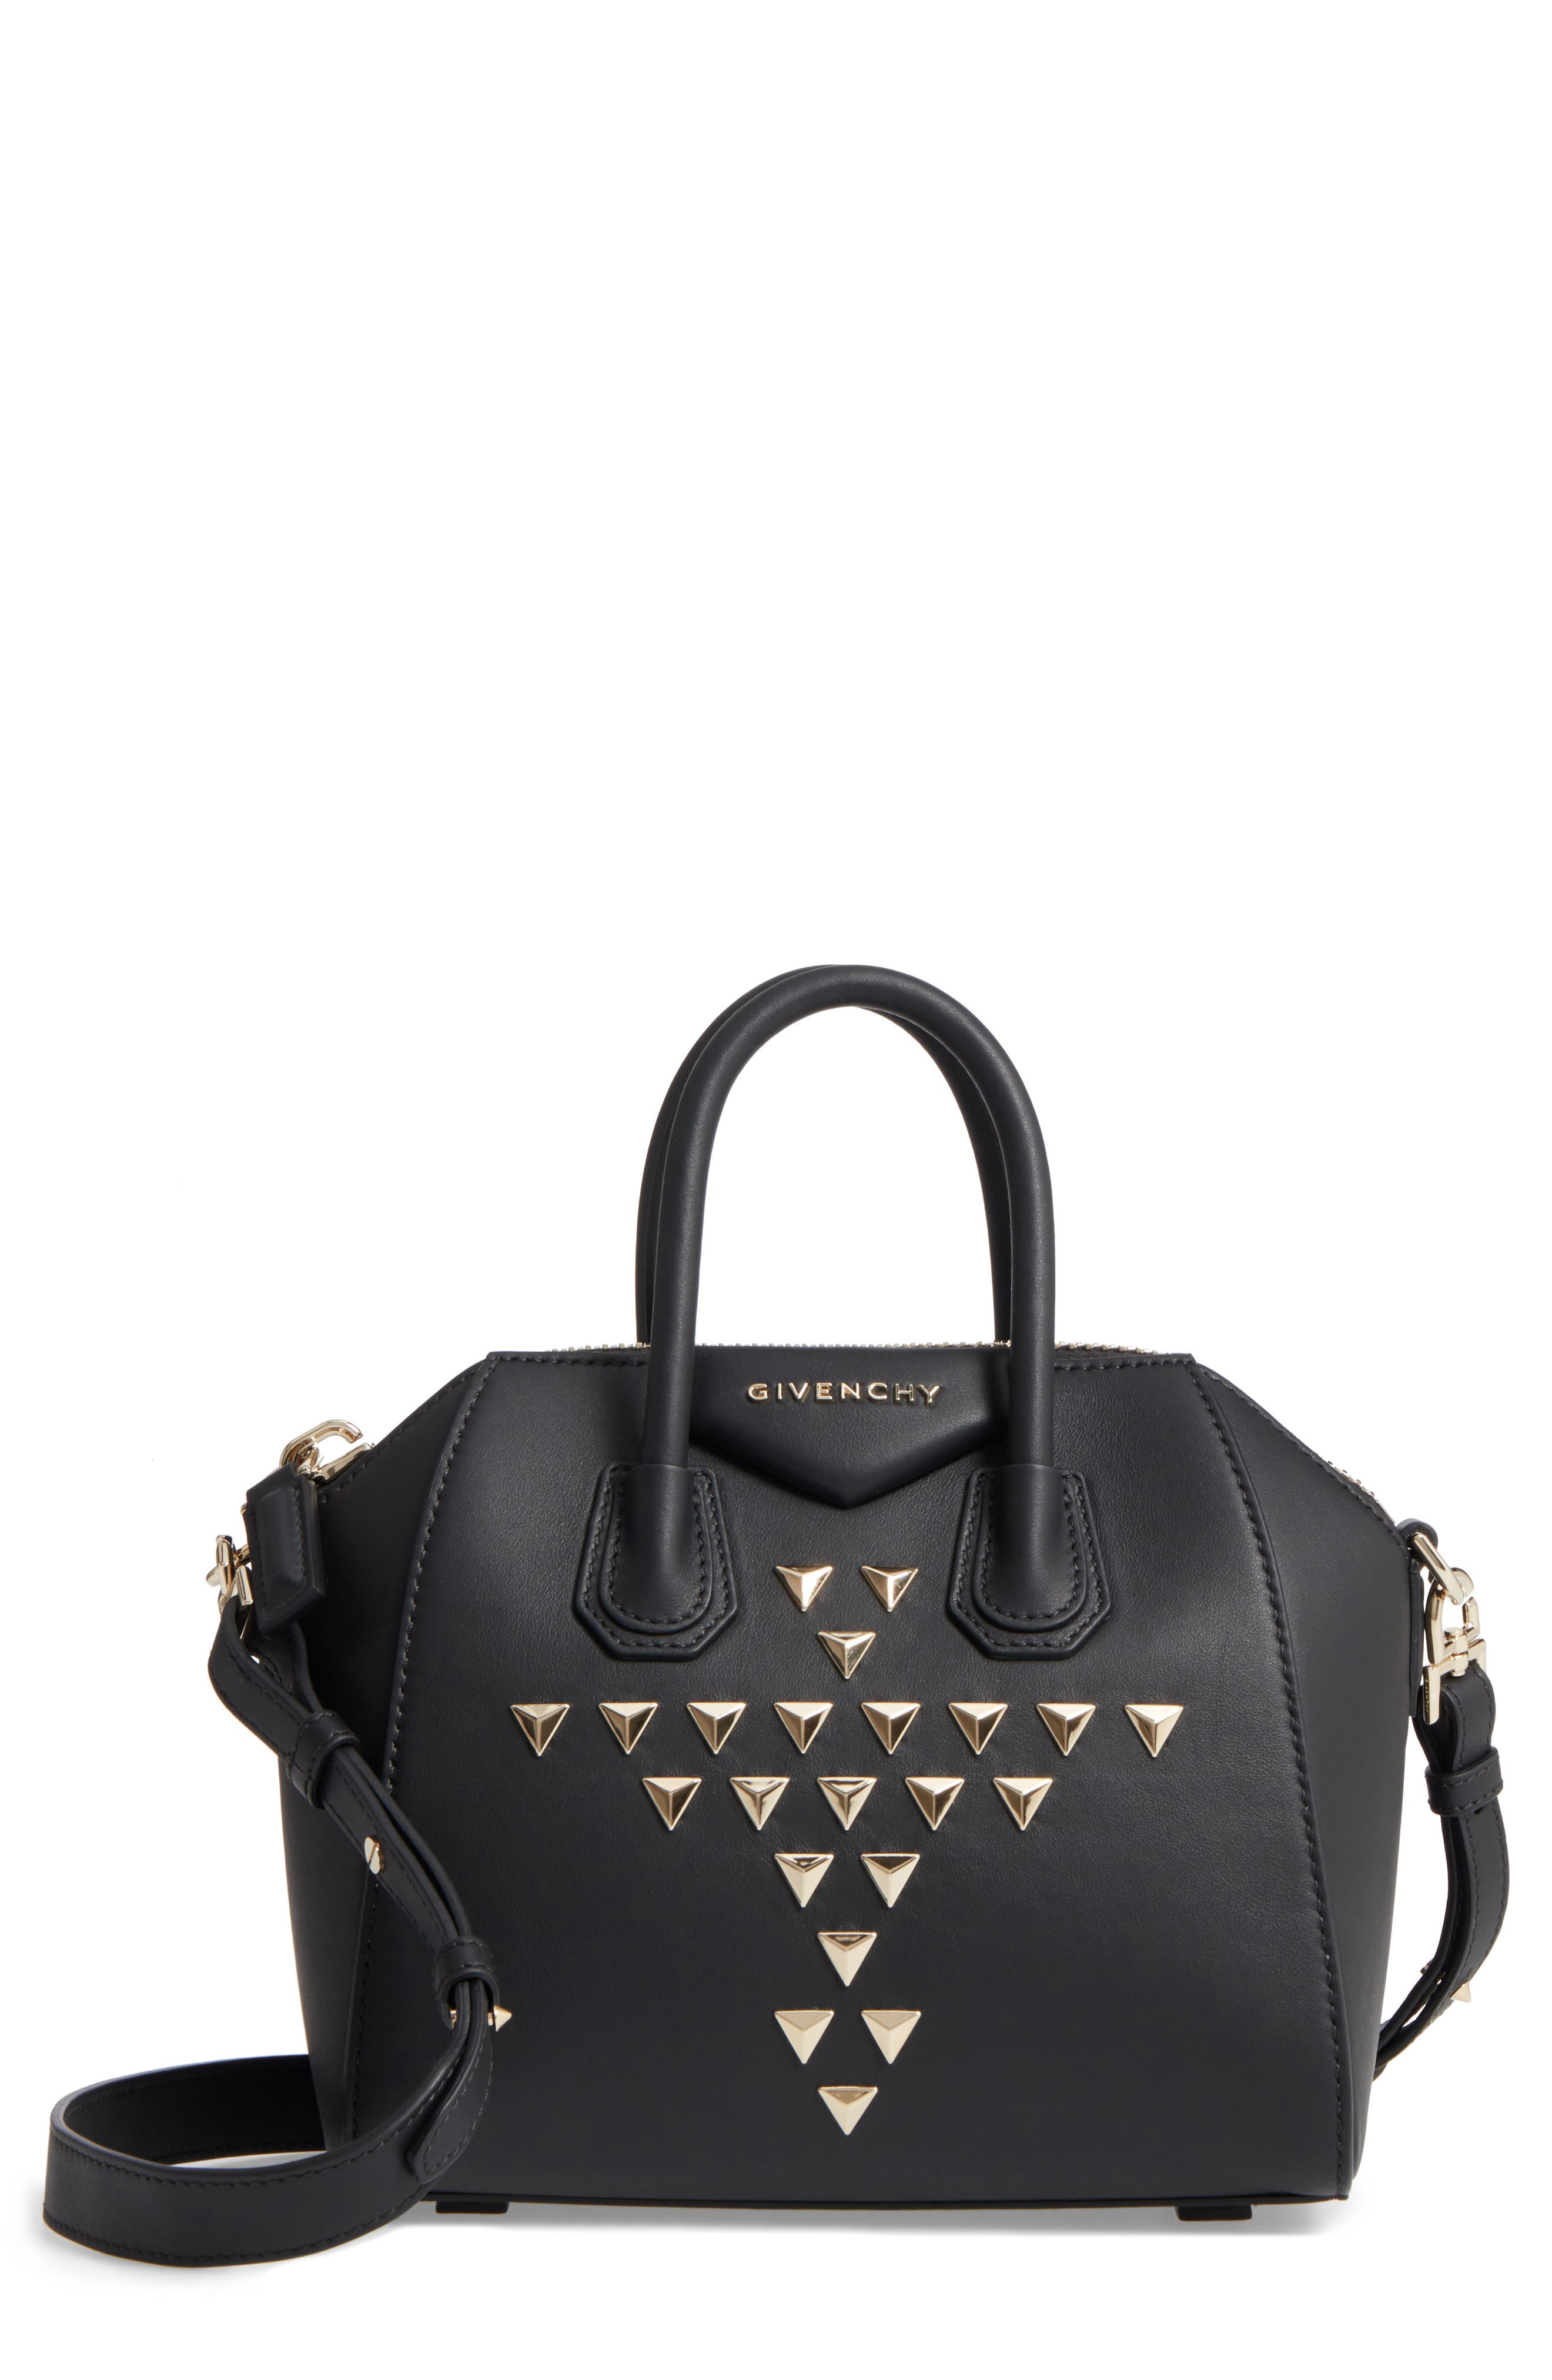 Givenchy Mini Antigona Triangle Stud Calfskin Leather Satchel